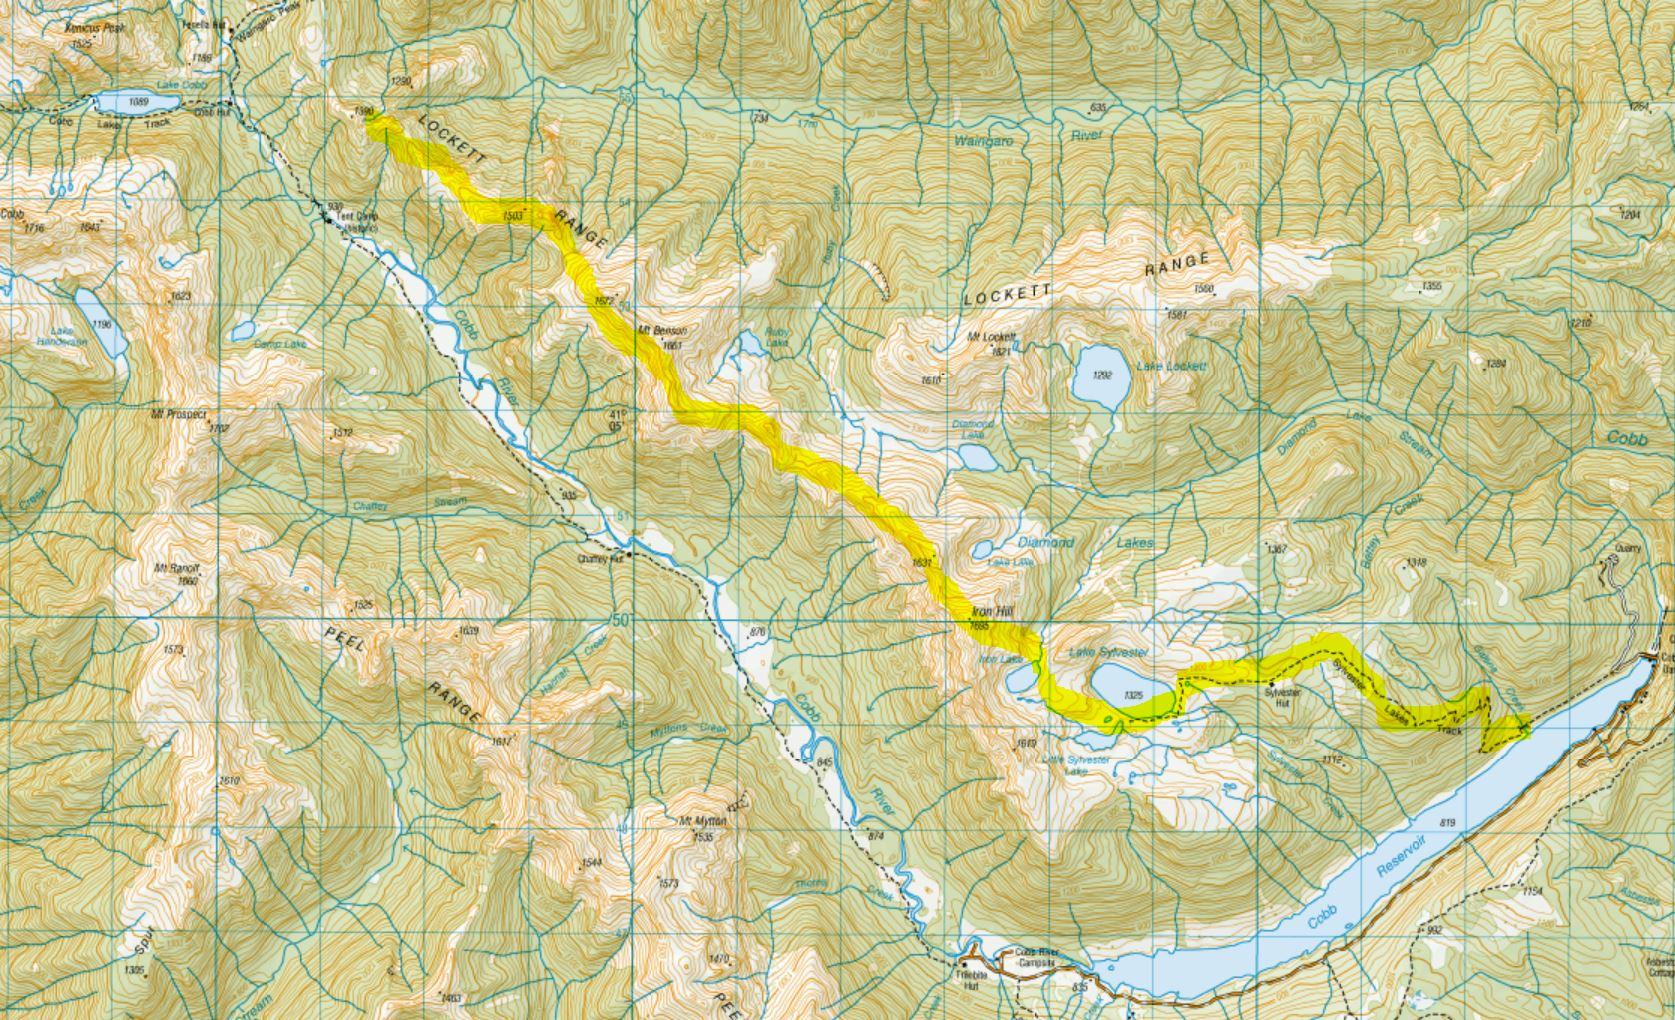 Day 1 - Across the tops of the Lockett Range